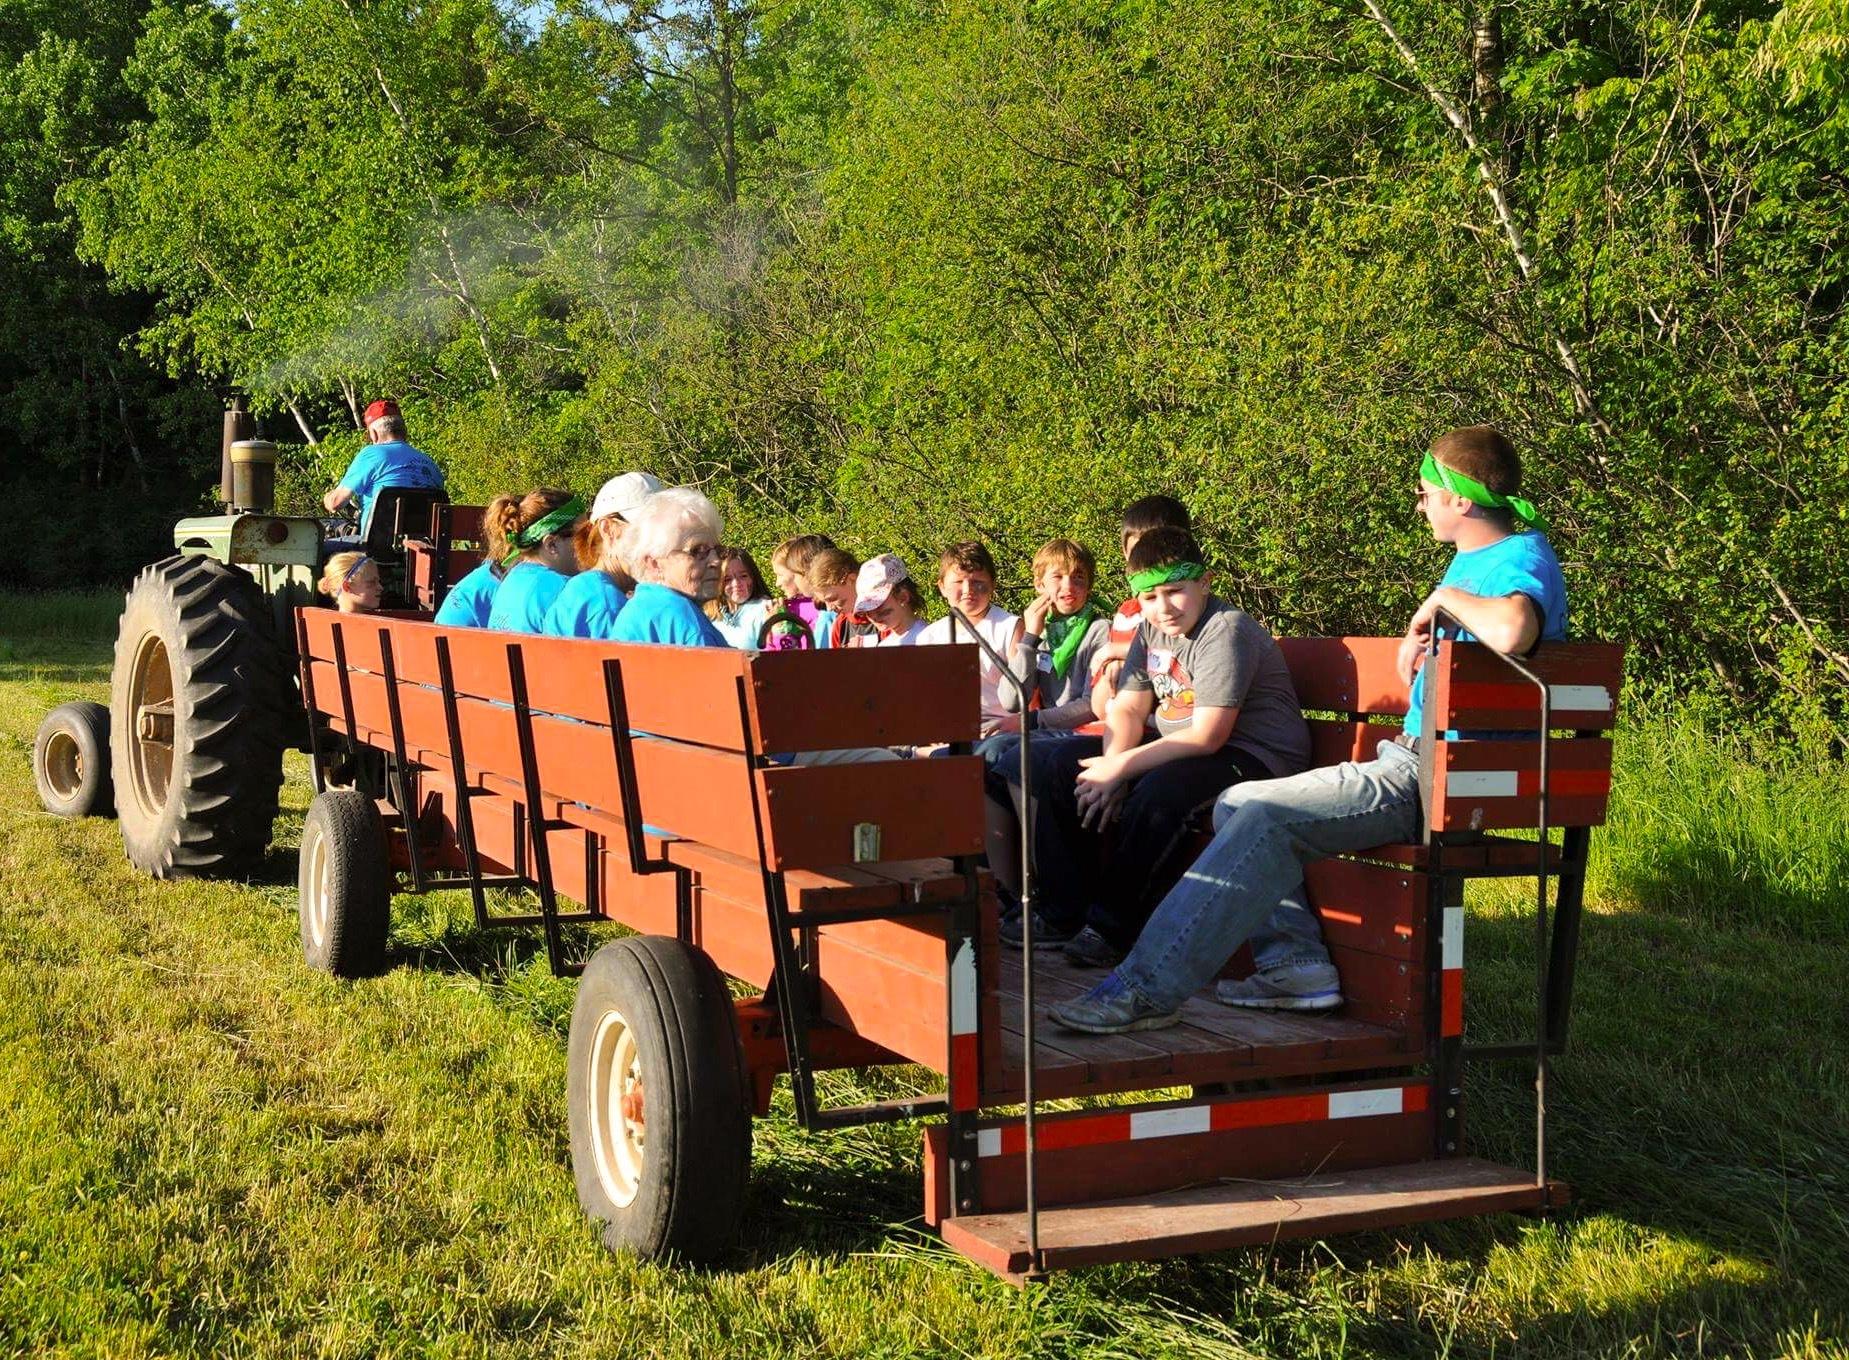 Farm Style Limo Ride